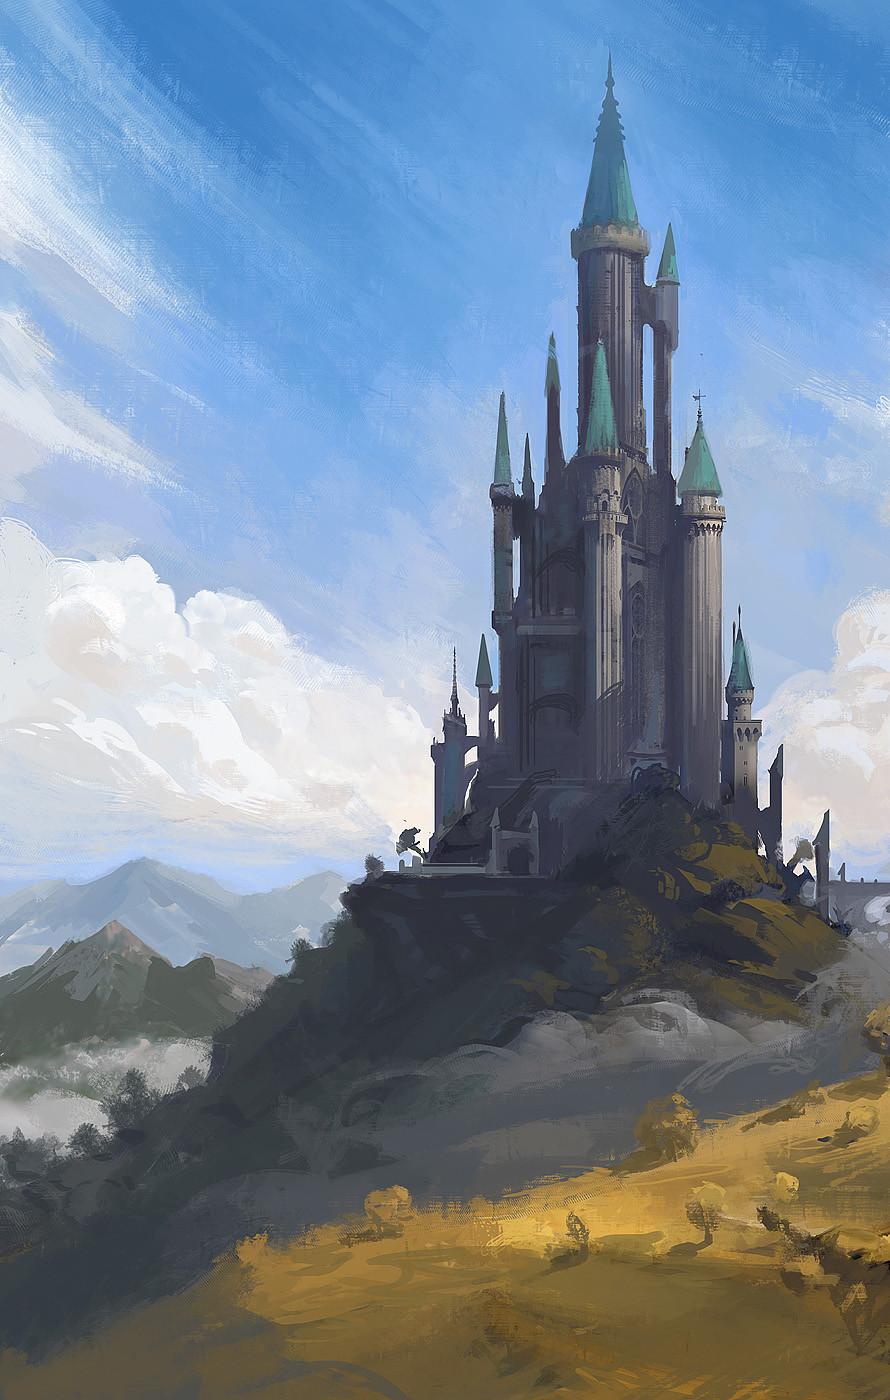 Just Castle